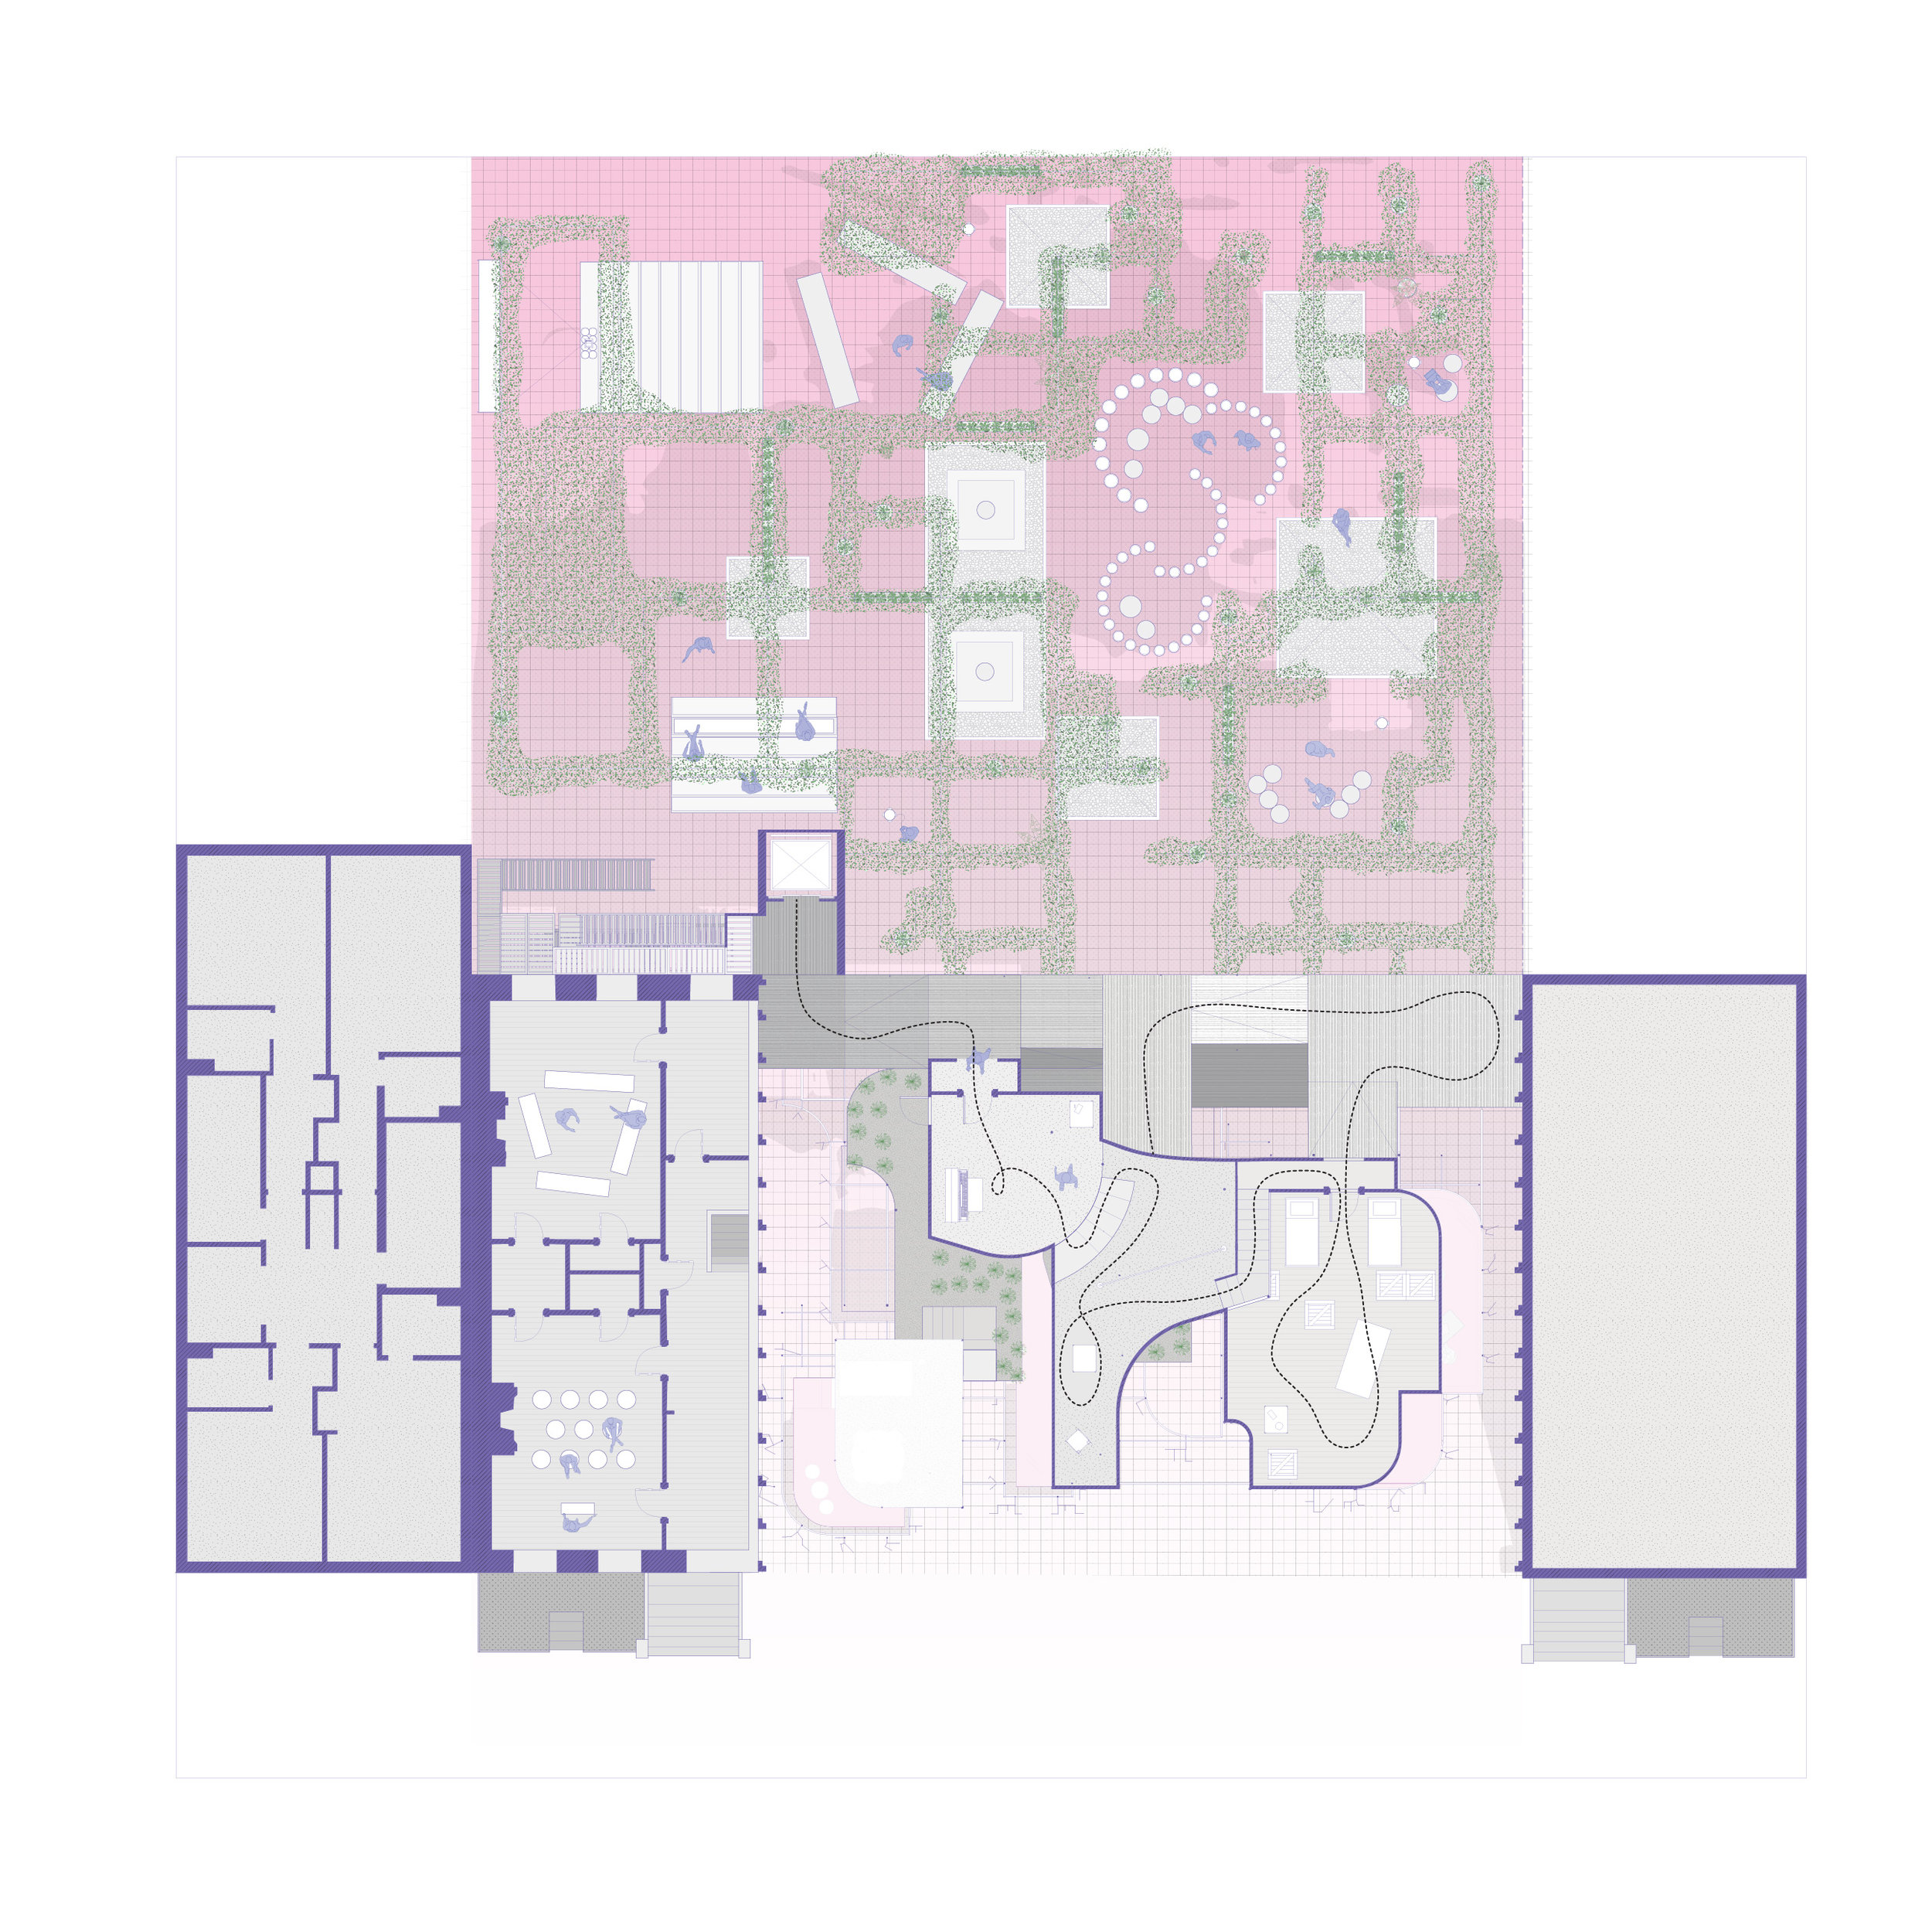 Museum level plan